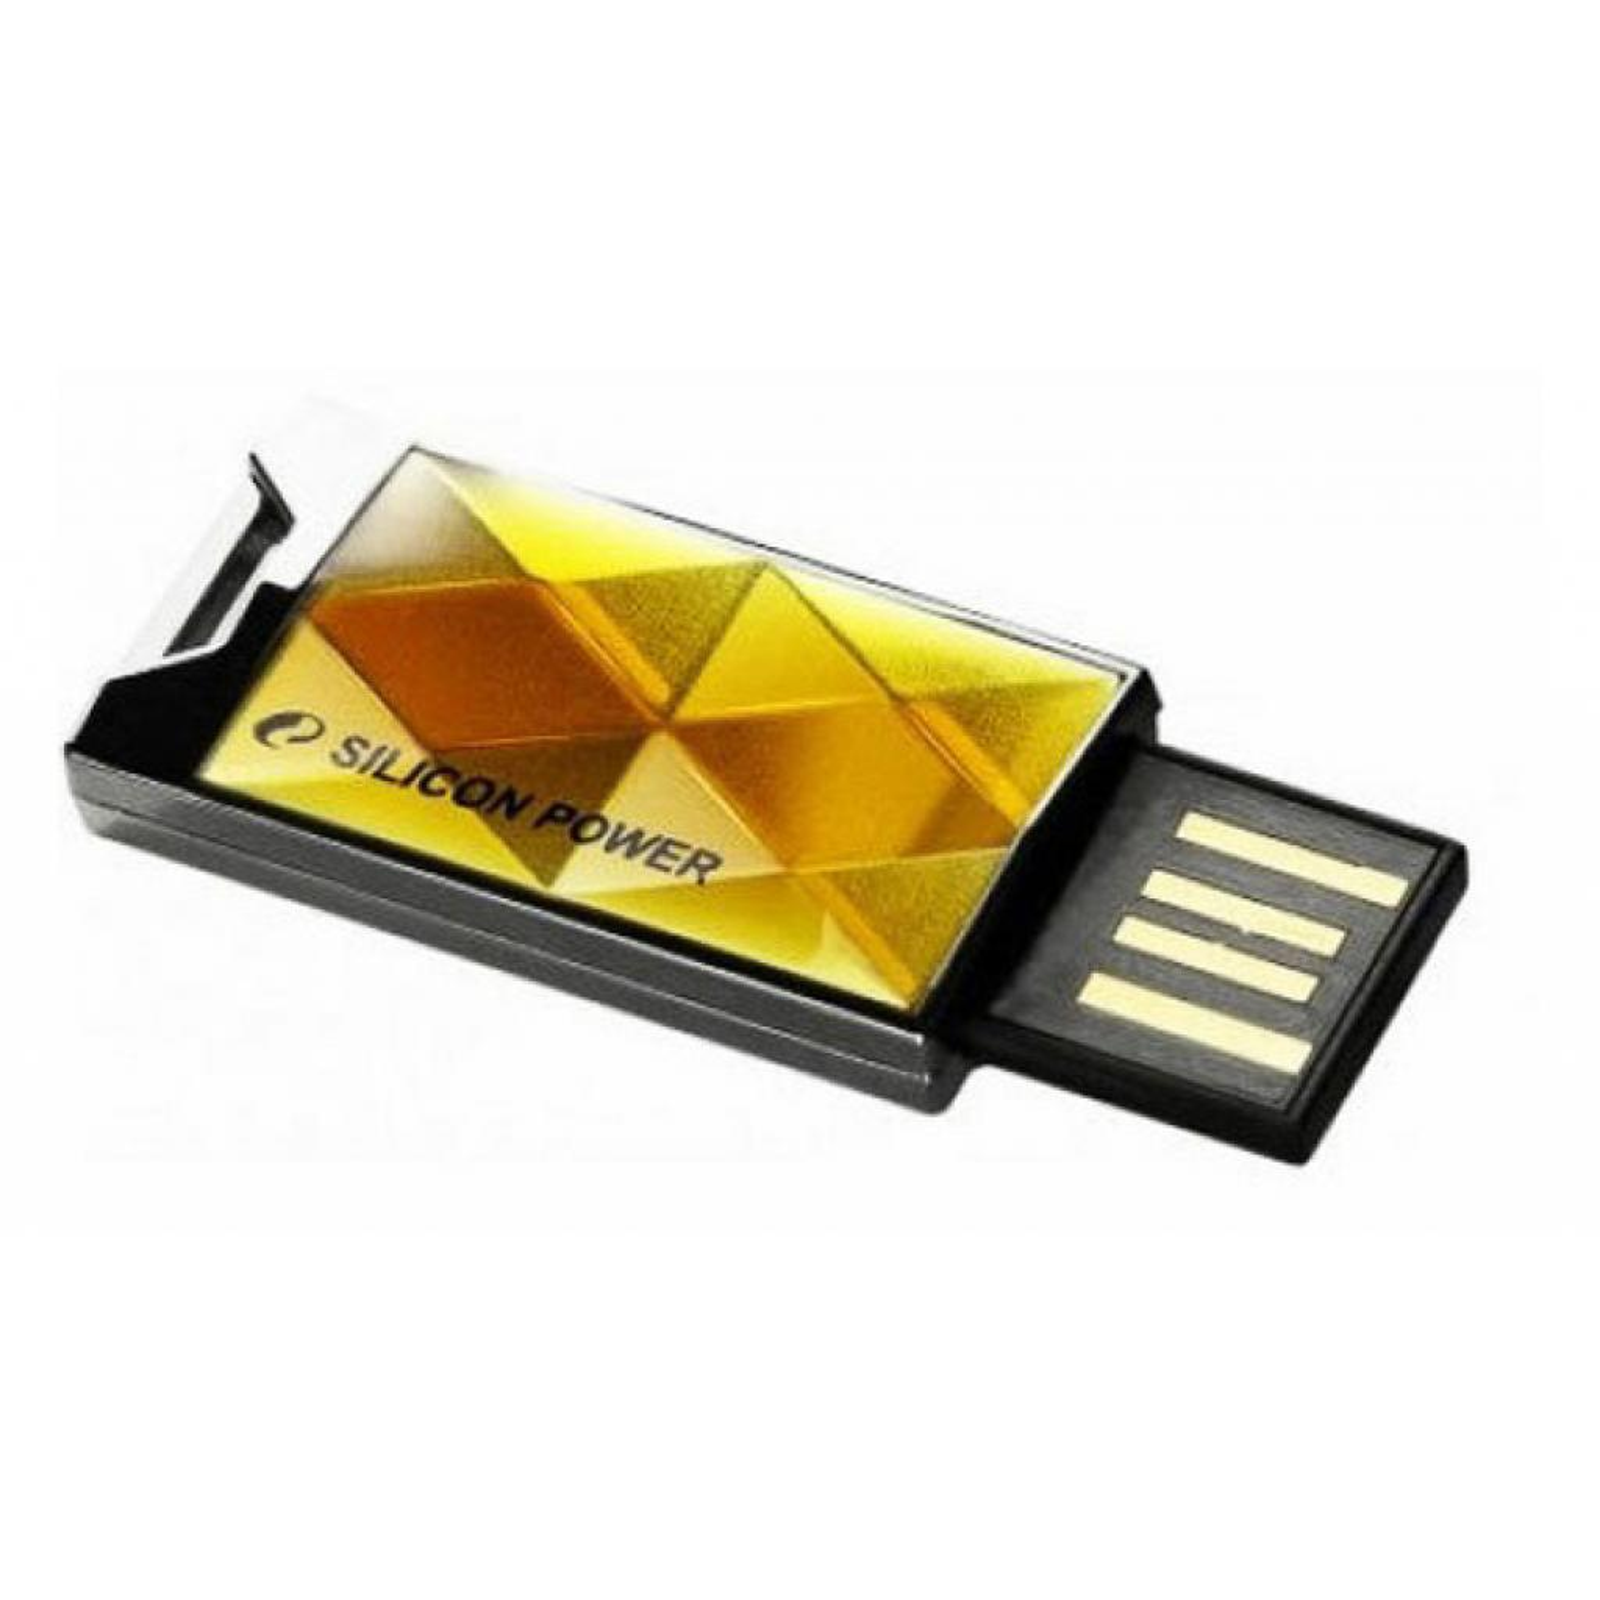 USB флеш накопитель Silicon Power 8Gb 850 amber (SP008GBUF2850V1A) изображение 2